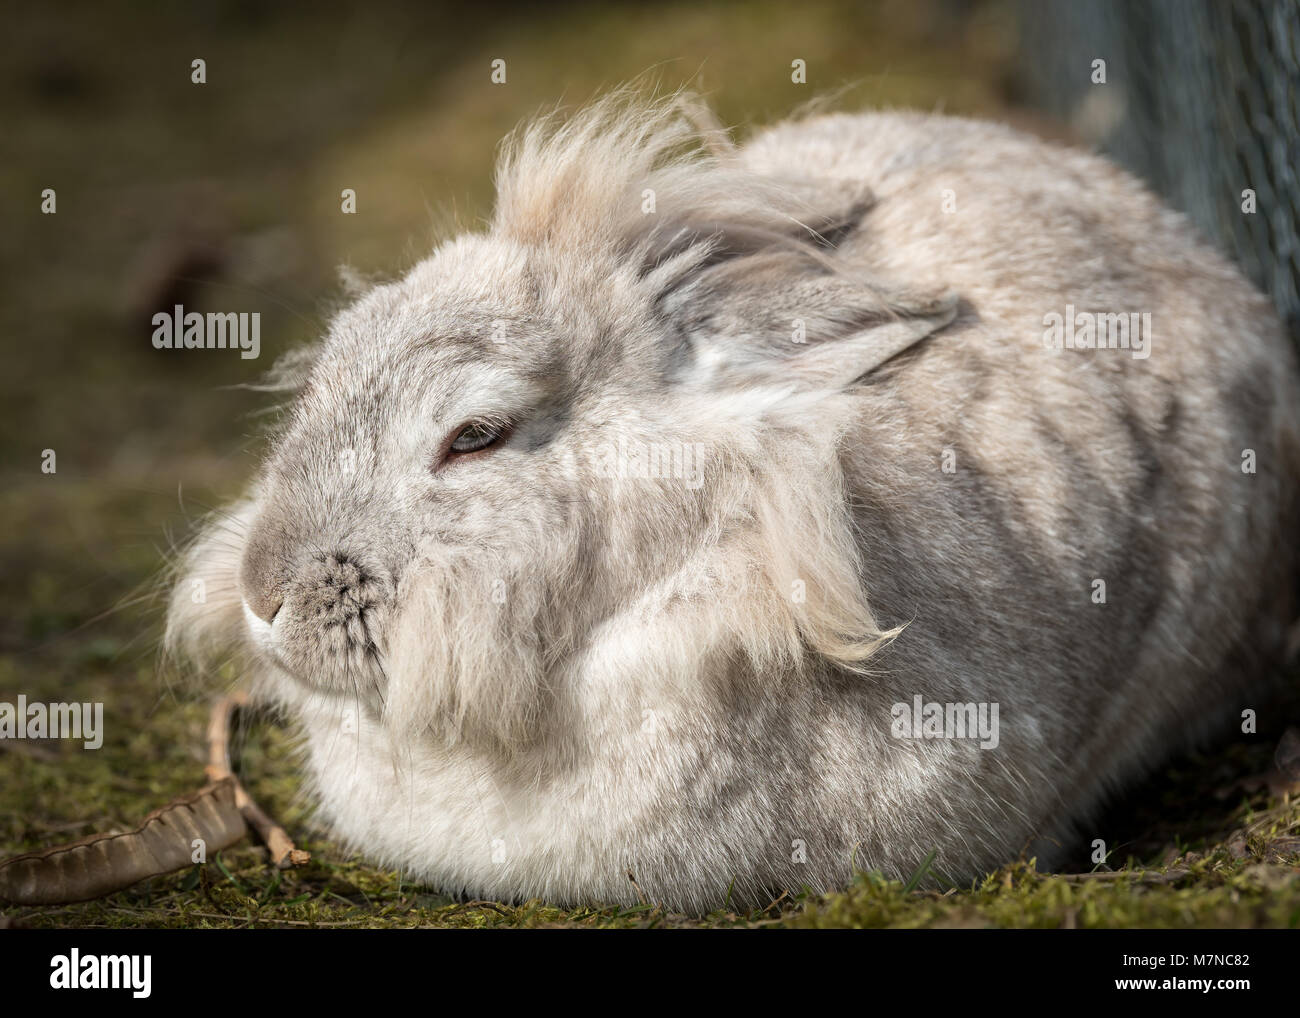 Un lapin nain blanc (lions head) prendre du repos Banque D'Images